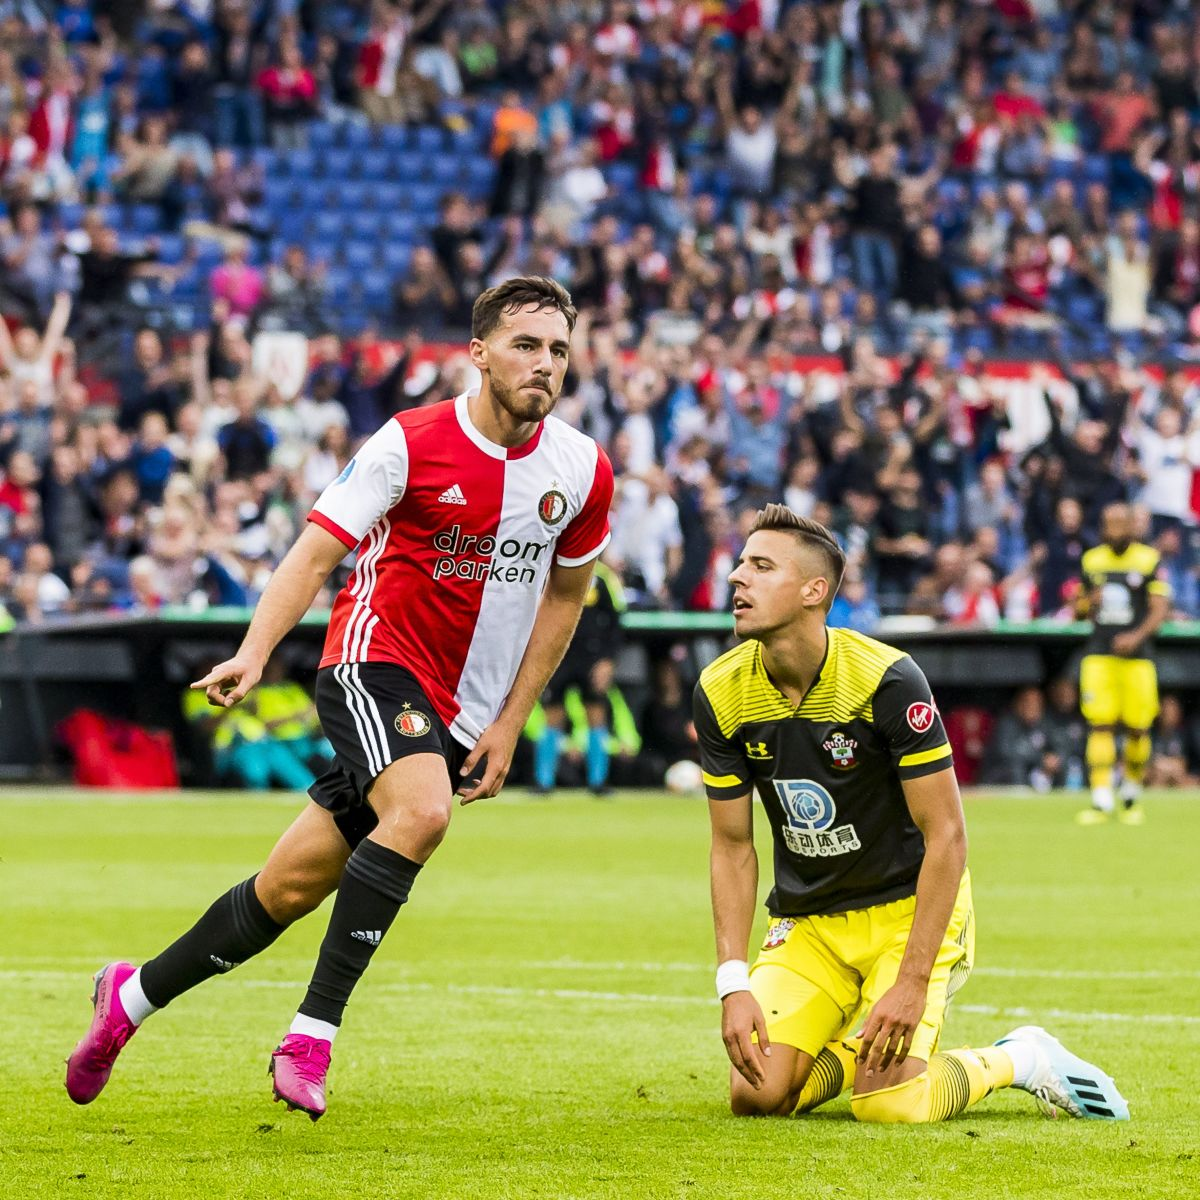 Kökçü scores versus Southampton in a pre-season friendly in 2019